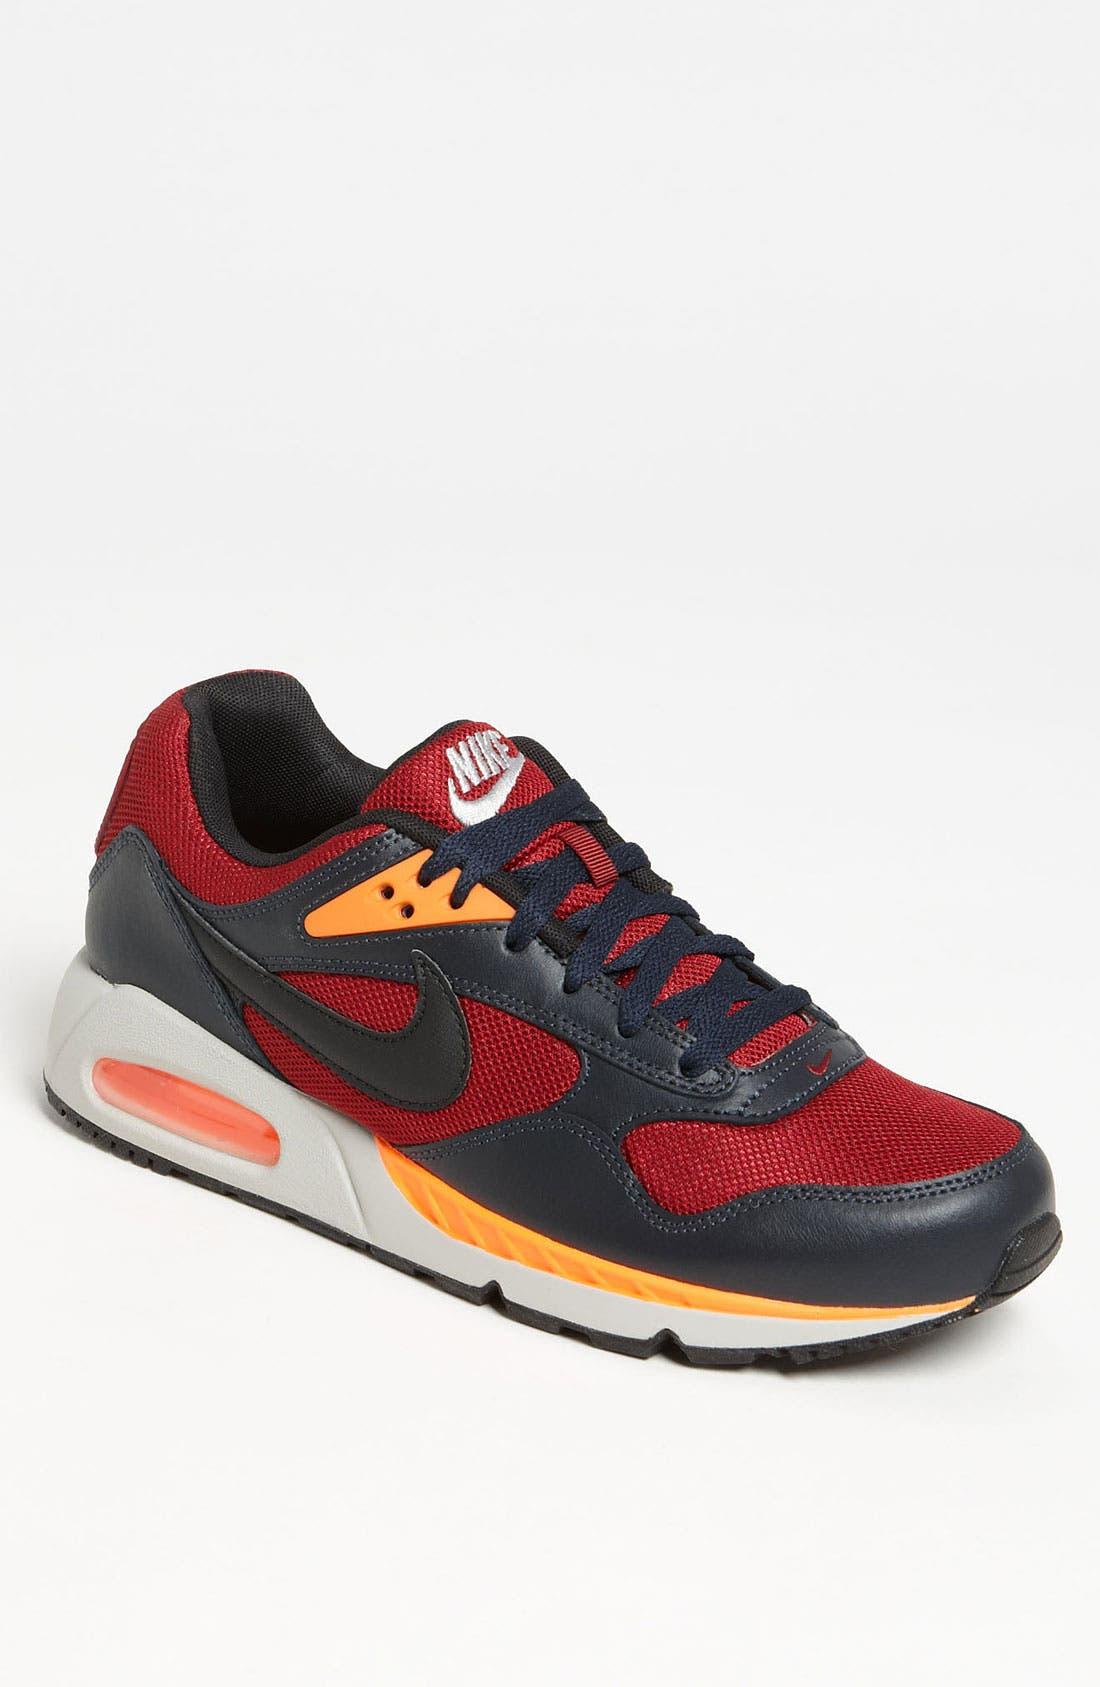 Main Image - Nike 'Air Max Correlate' Sneaker (Men) (Online Only)